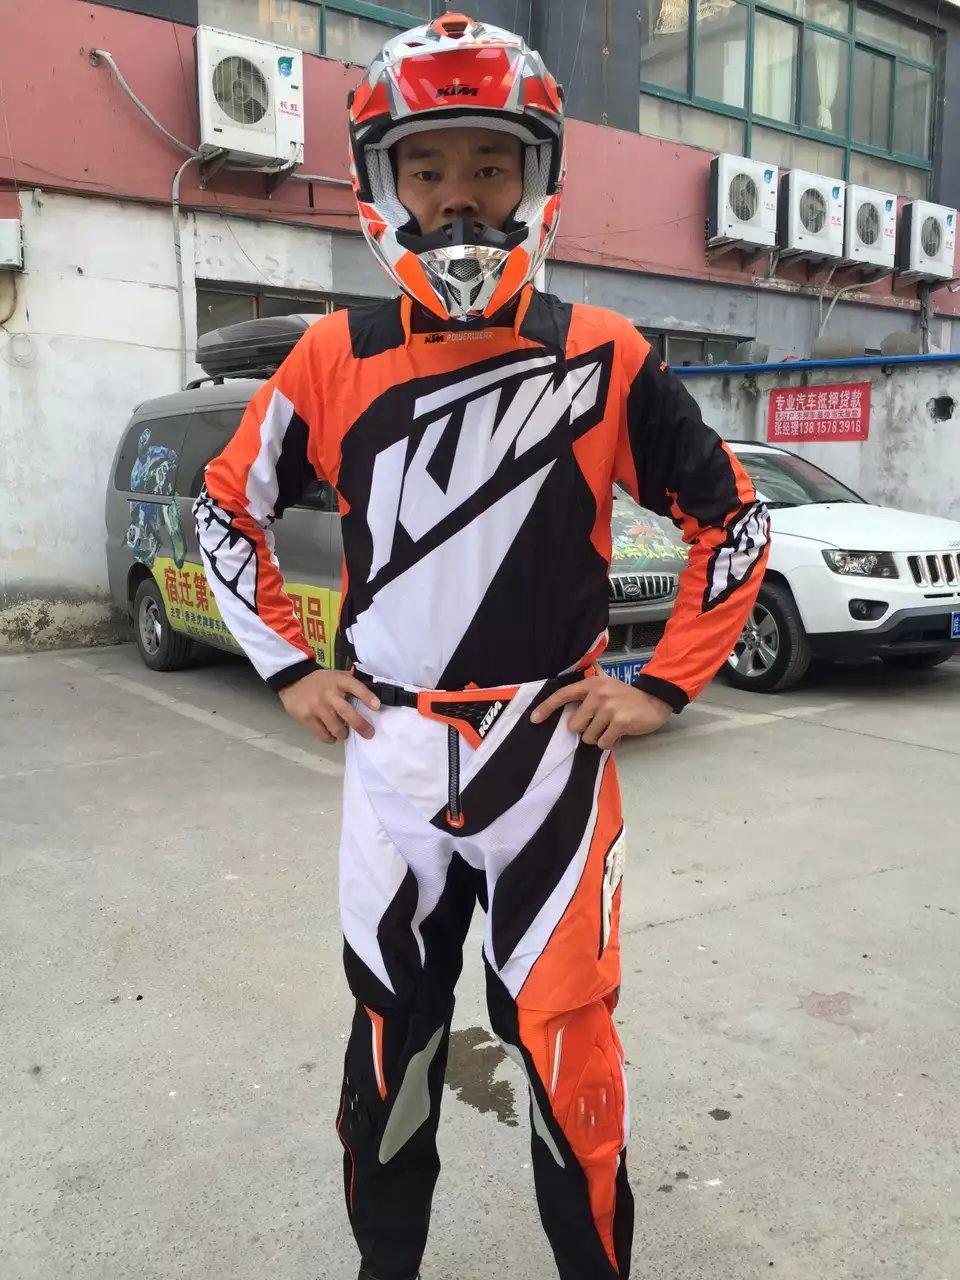 Equipo de carreras de motocross KTM Motocross Jersey/pantalones de Carreras de Motocross traje